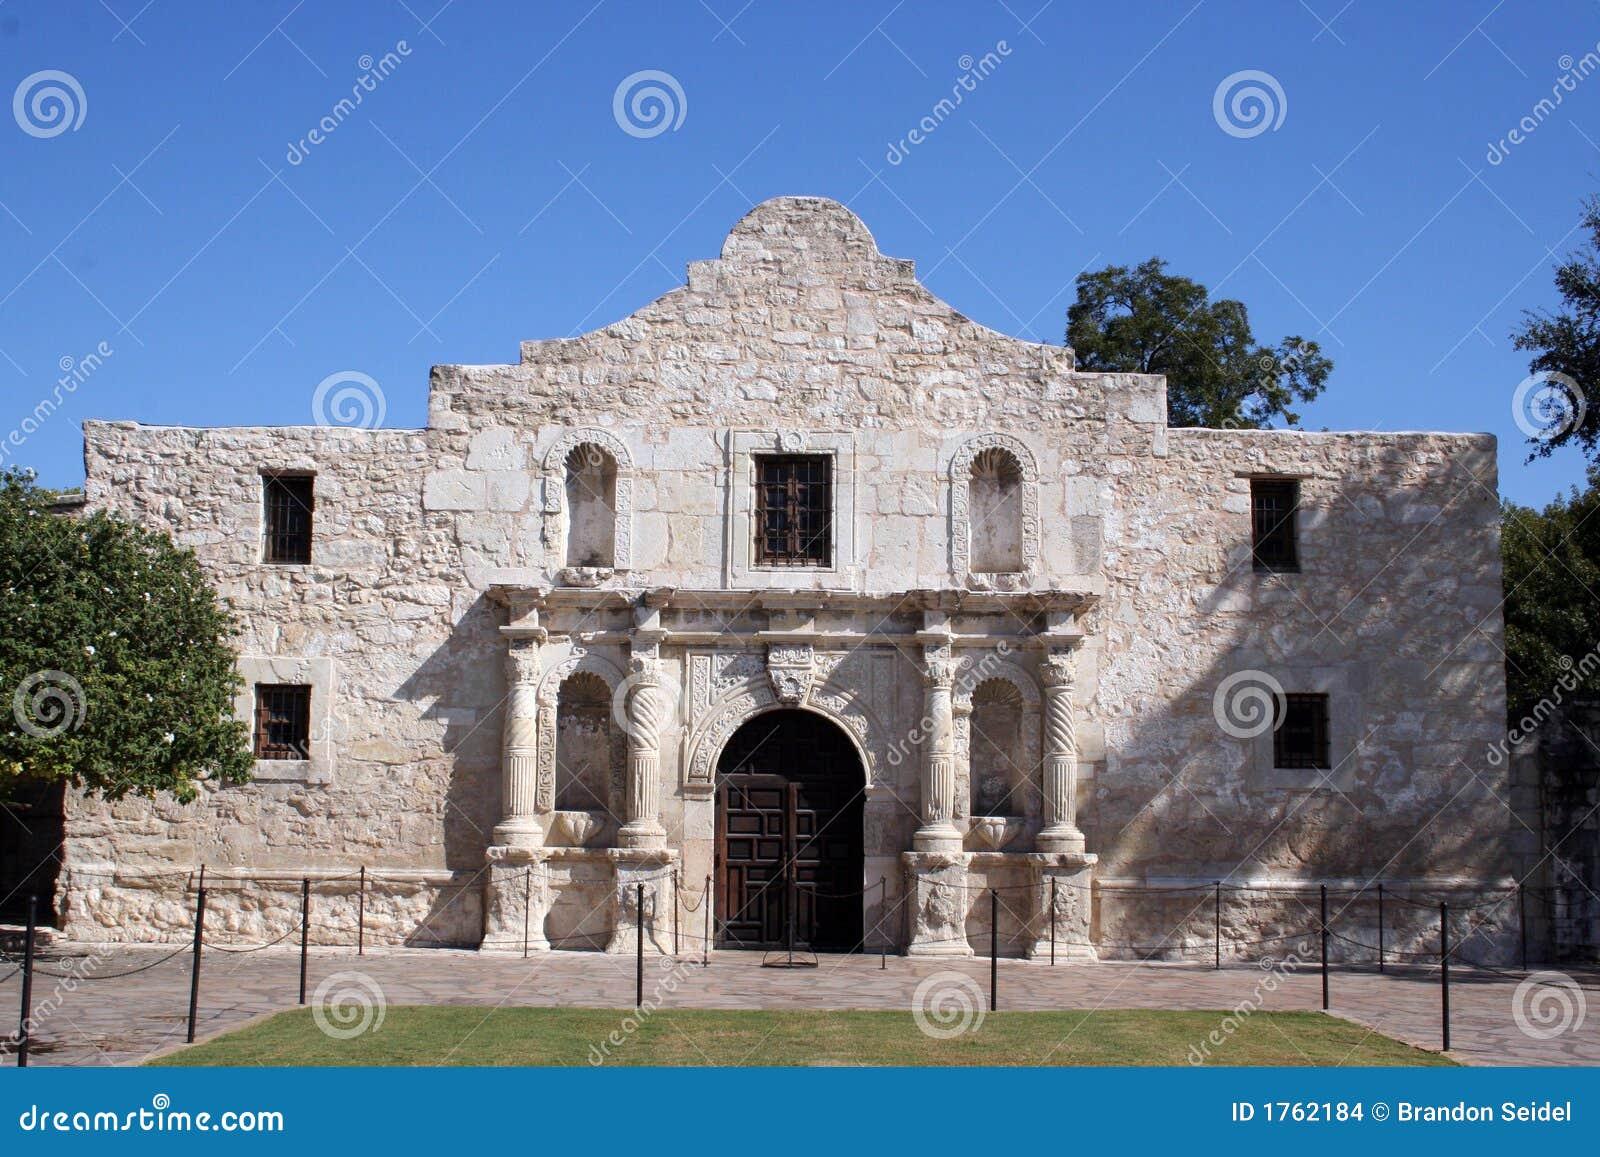 Alamo In San Antonio Stock Images Image 1762184